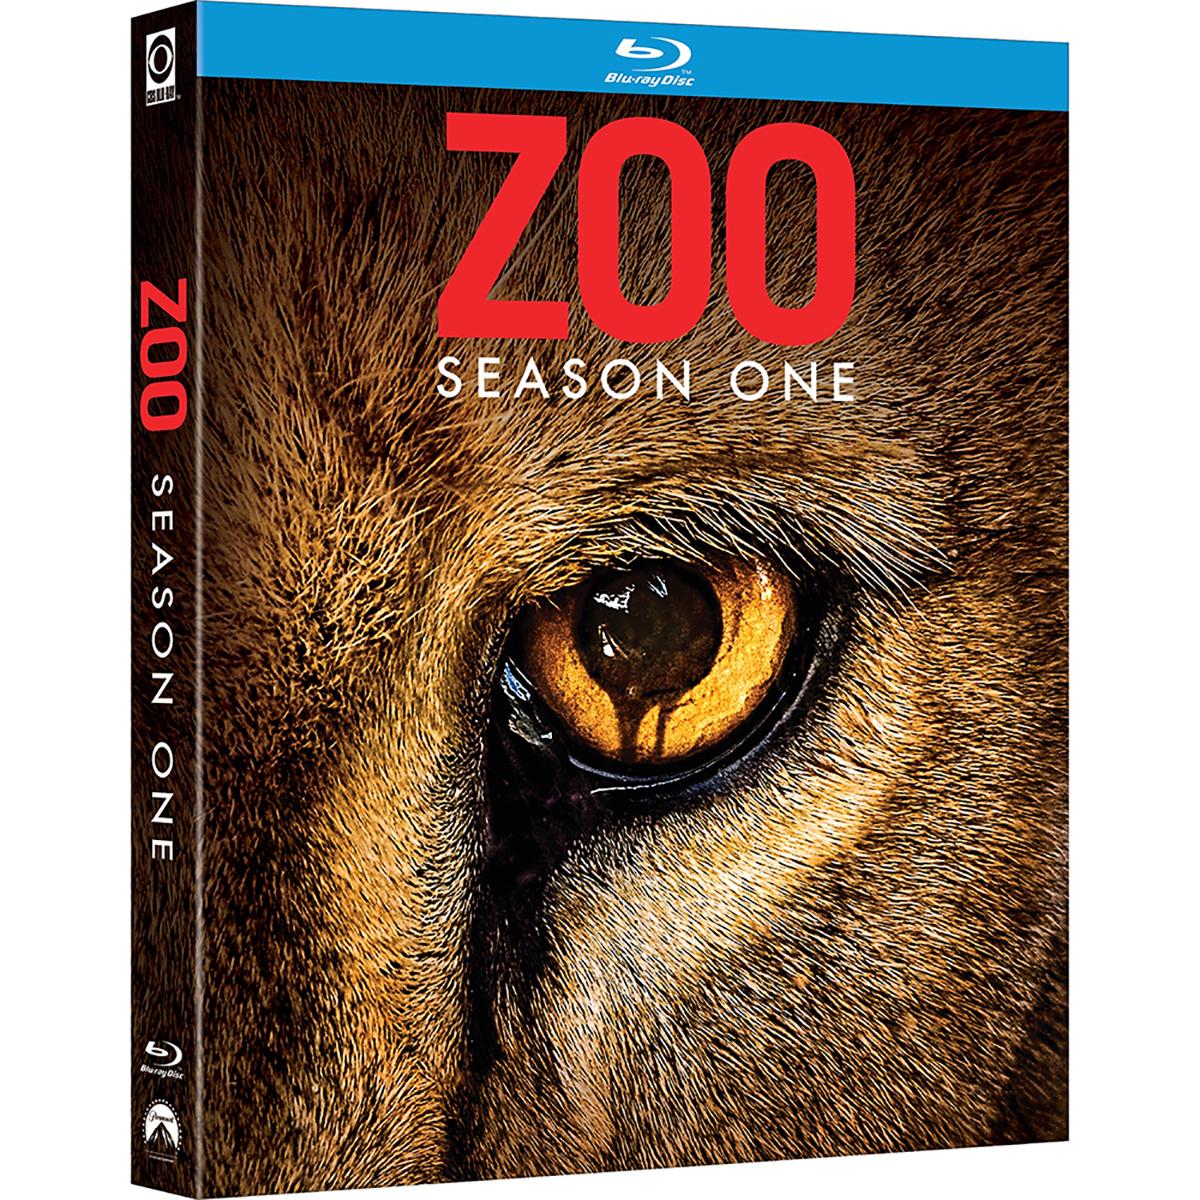 Zoo: Season 1 Blu-ray -  DVDs & Videos 6445-921550